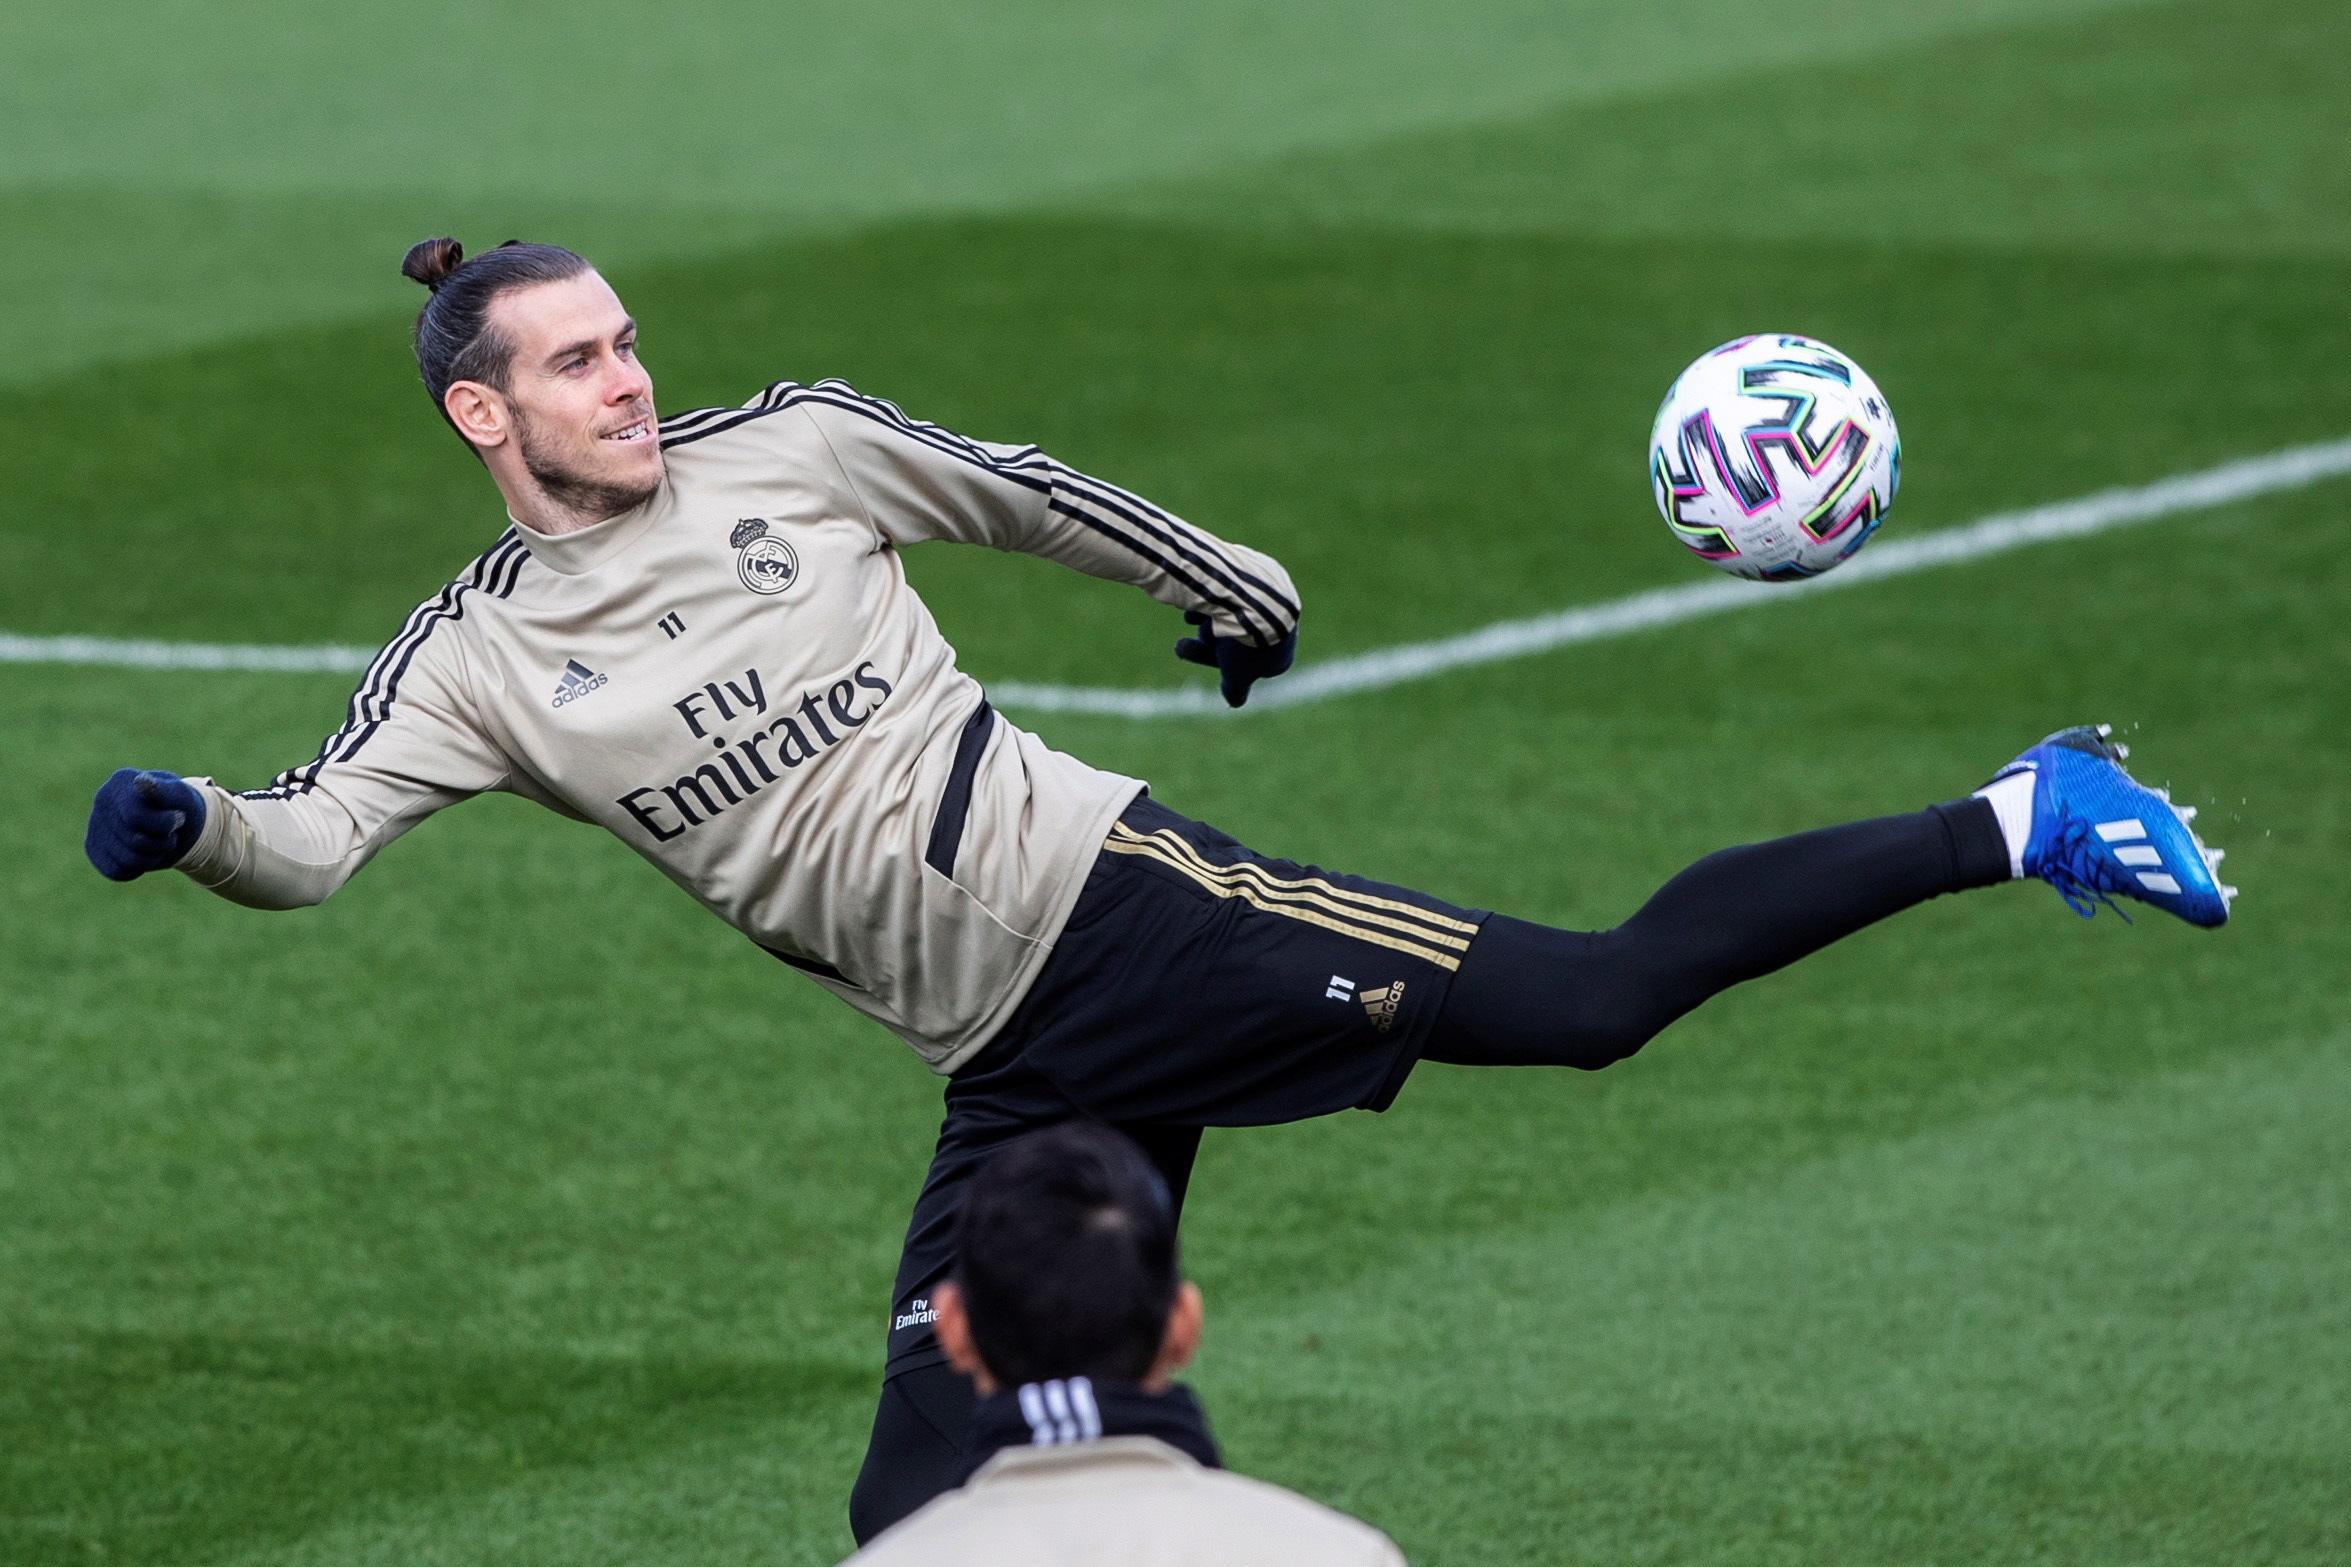 Gareth Bale the footballer is in great shape